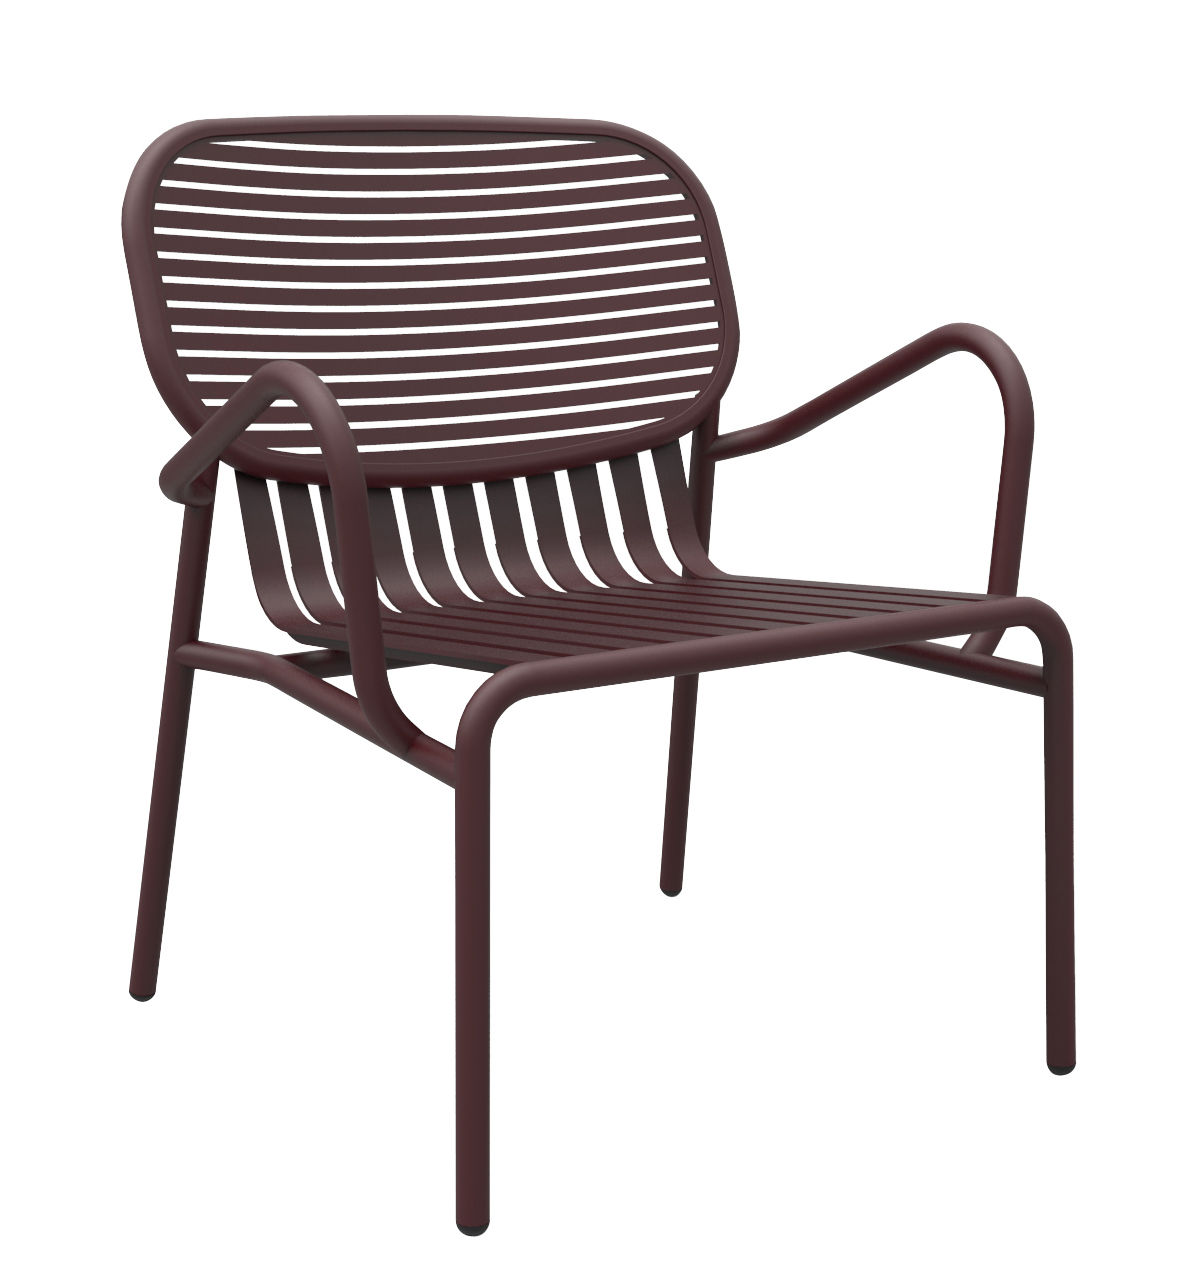 Furniture - Armchairs - Week-end Low armchair - Aluminium by Petite Friture - Burgundy - Powder coated epoxy aluminium